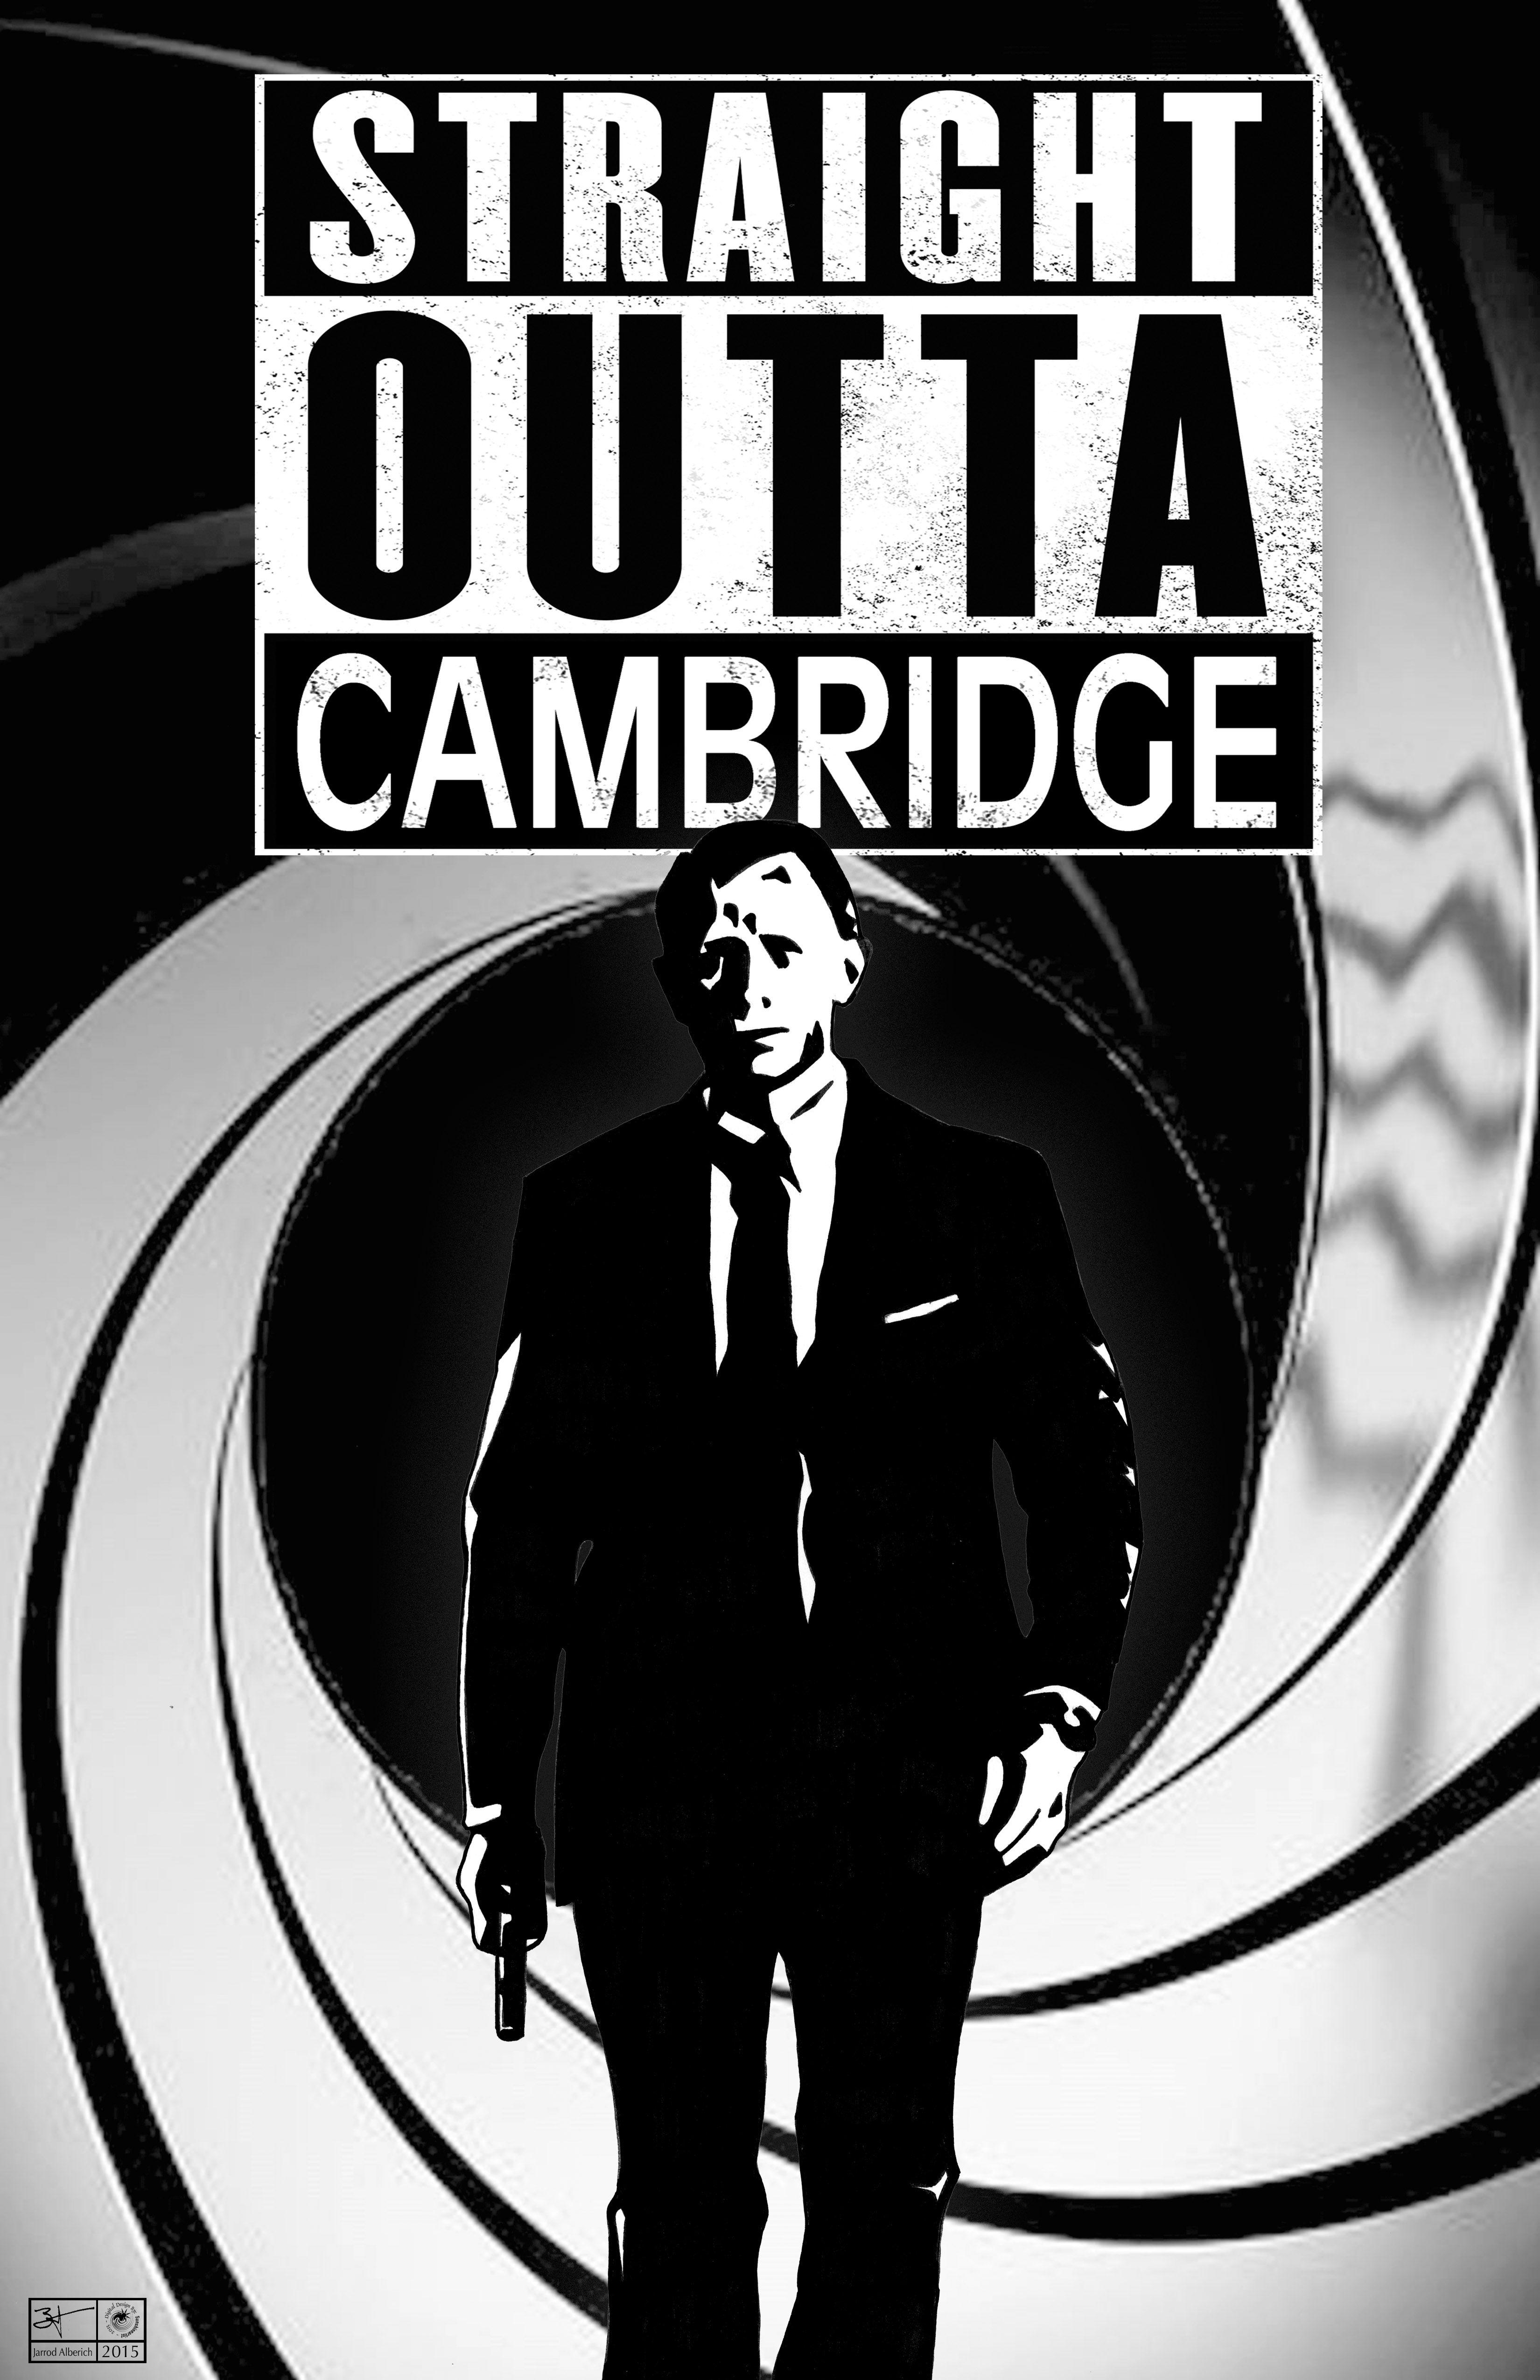 Pin by Zackary Brown on James bond James bond, Fictional